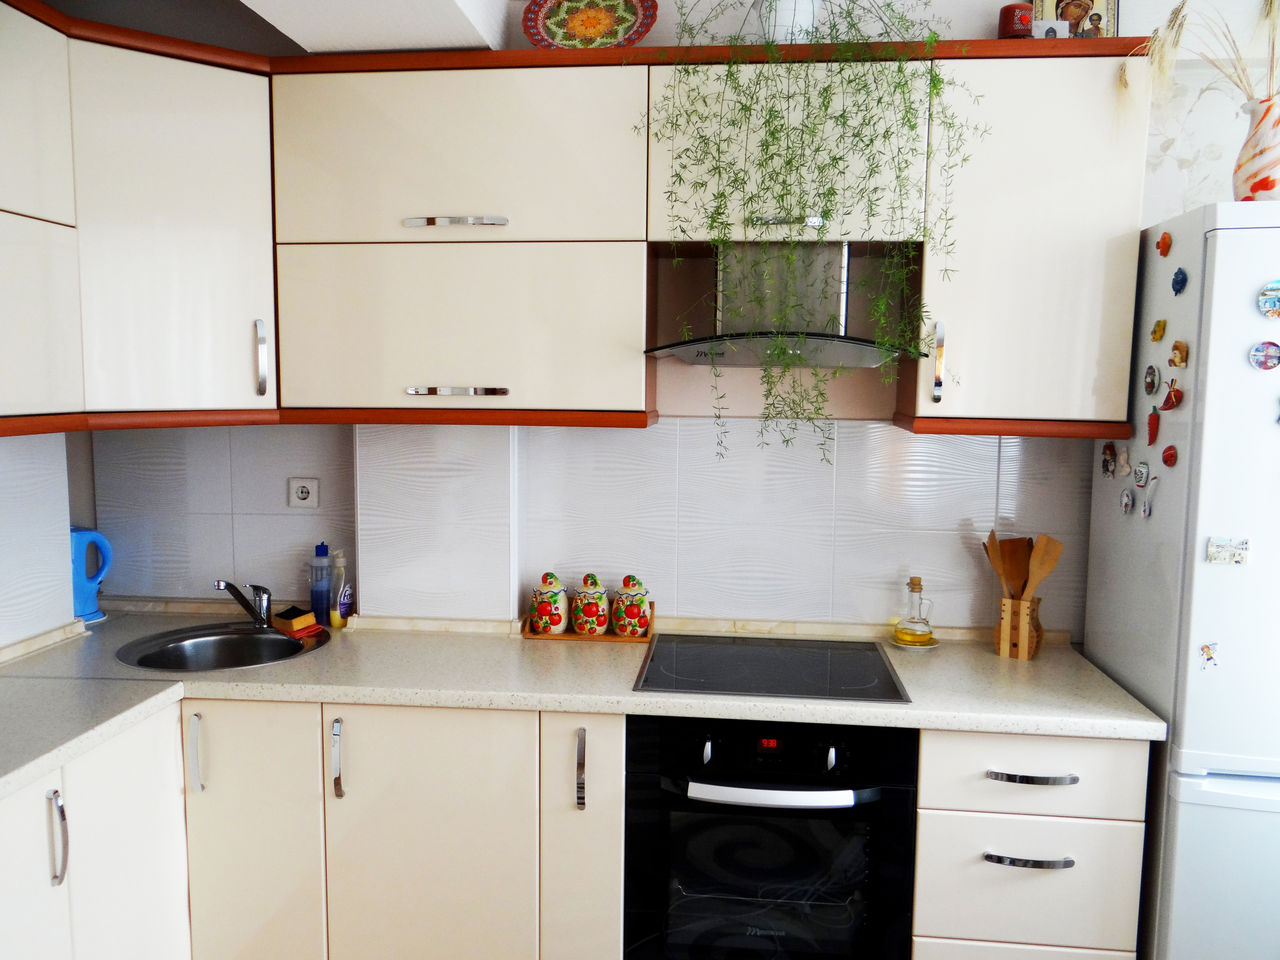 reducere de pret cu 1000 euro. Black Bedroom Furniture Sets. Home Design Ideas